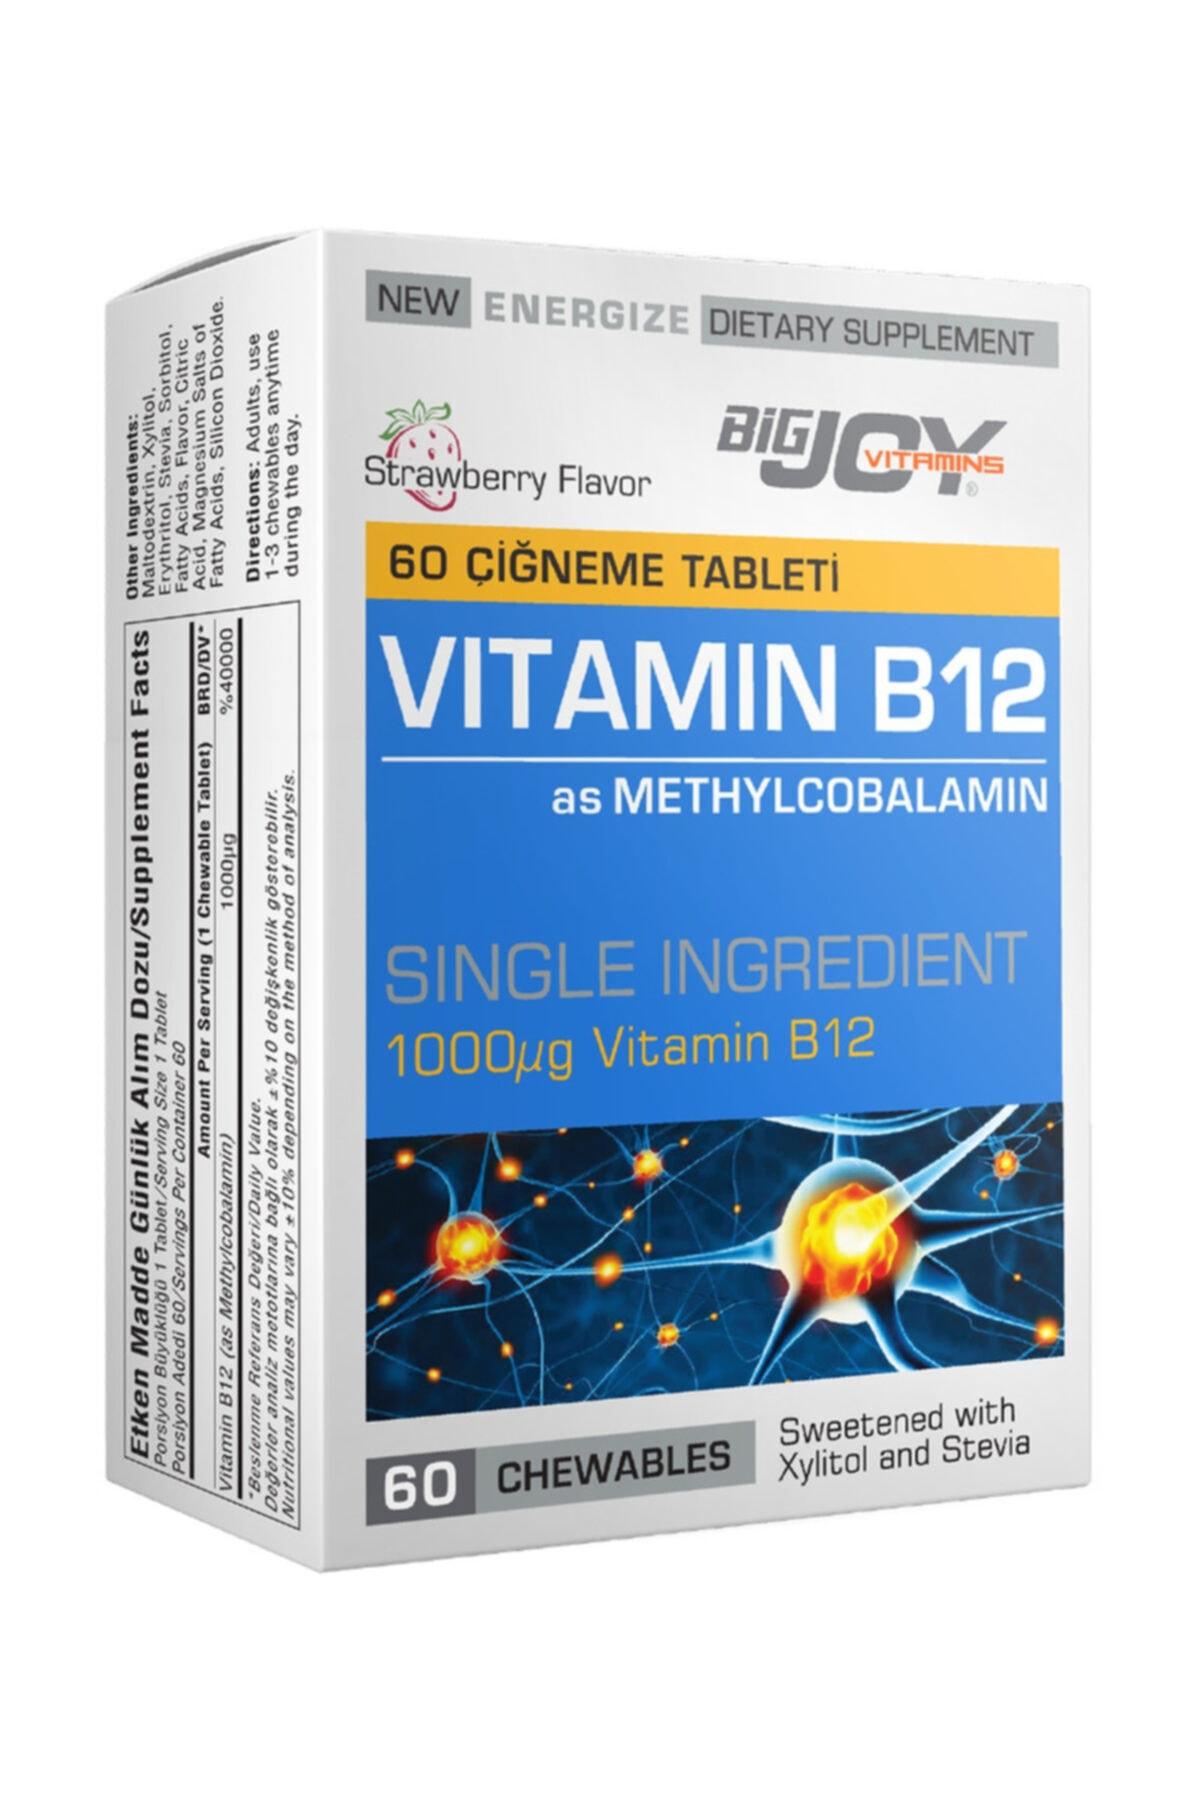 Big Joy Bigjoy Vitamins Vitamin B12 60 Çigneme Tableti 1